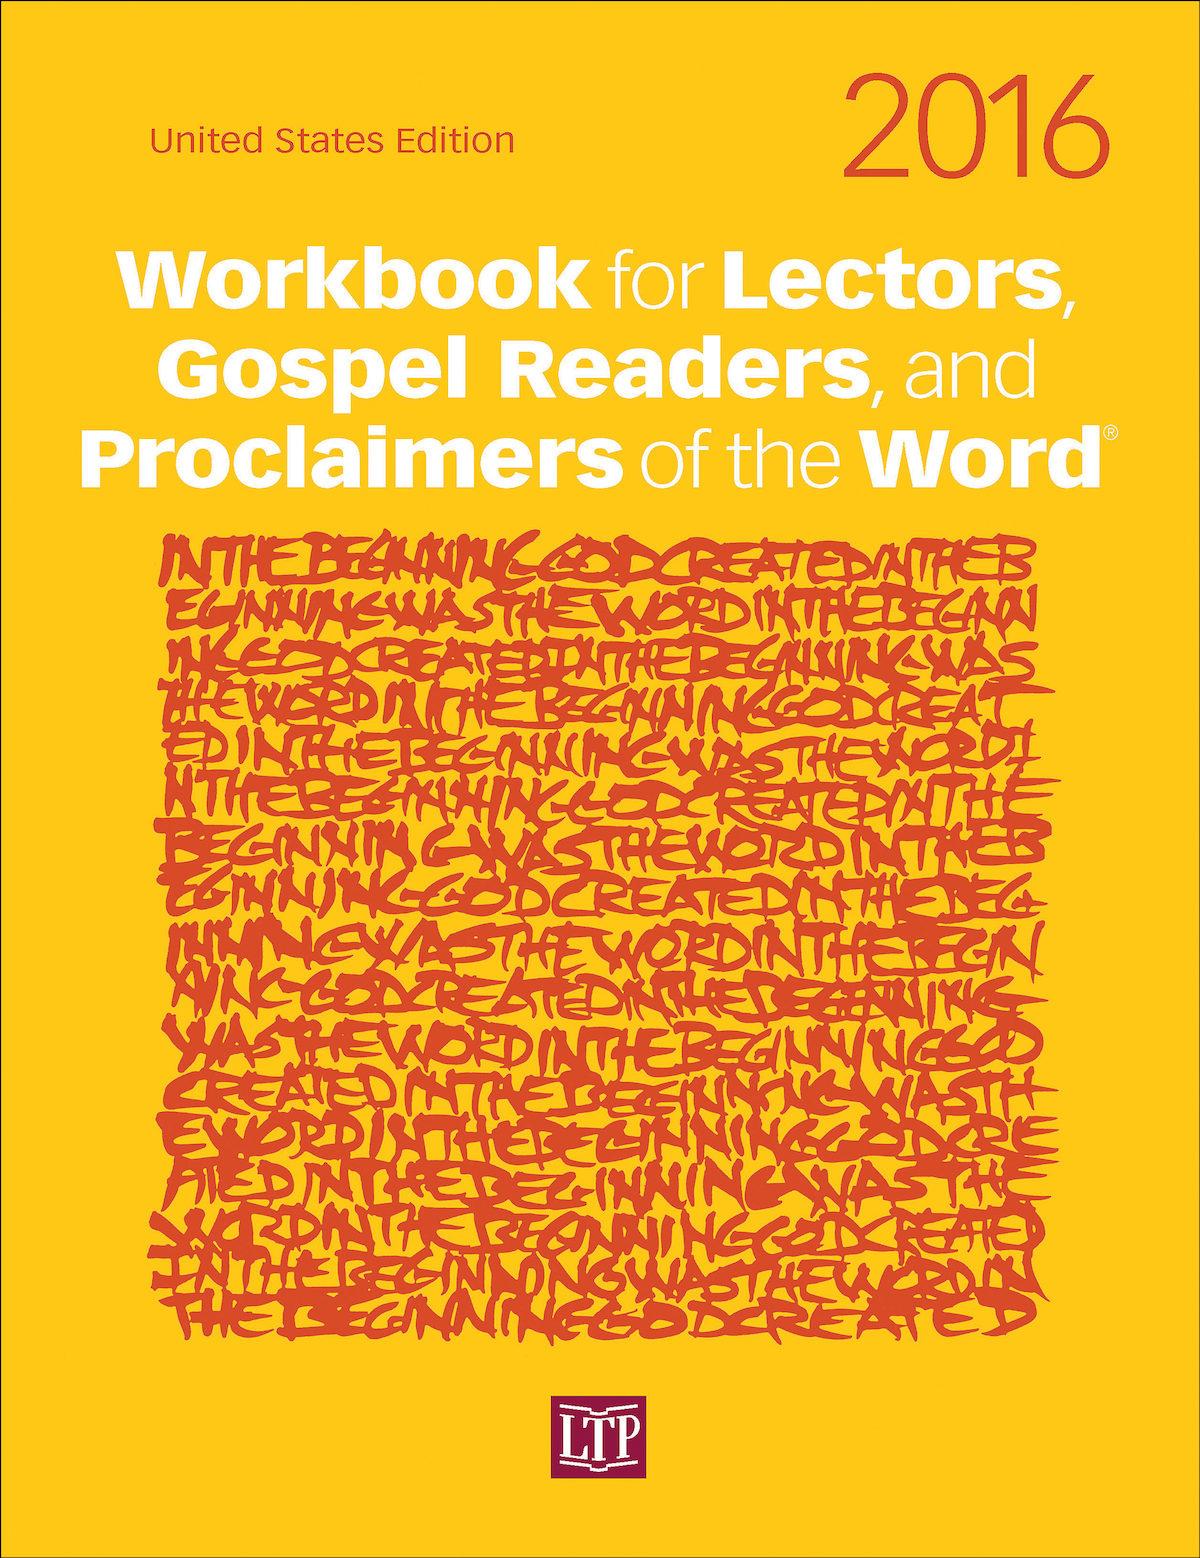 Workbook for Lectors and Gospel Readers 2016